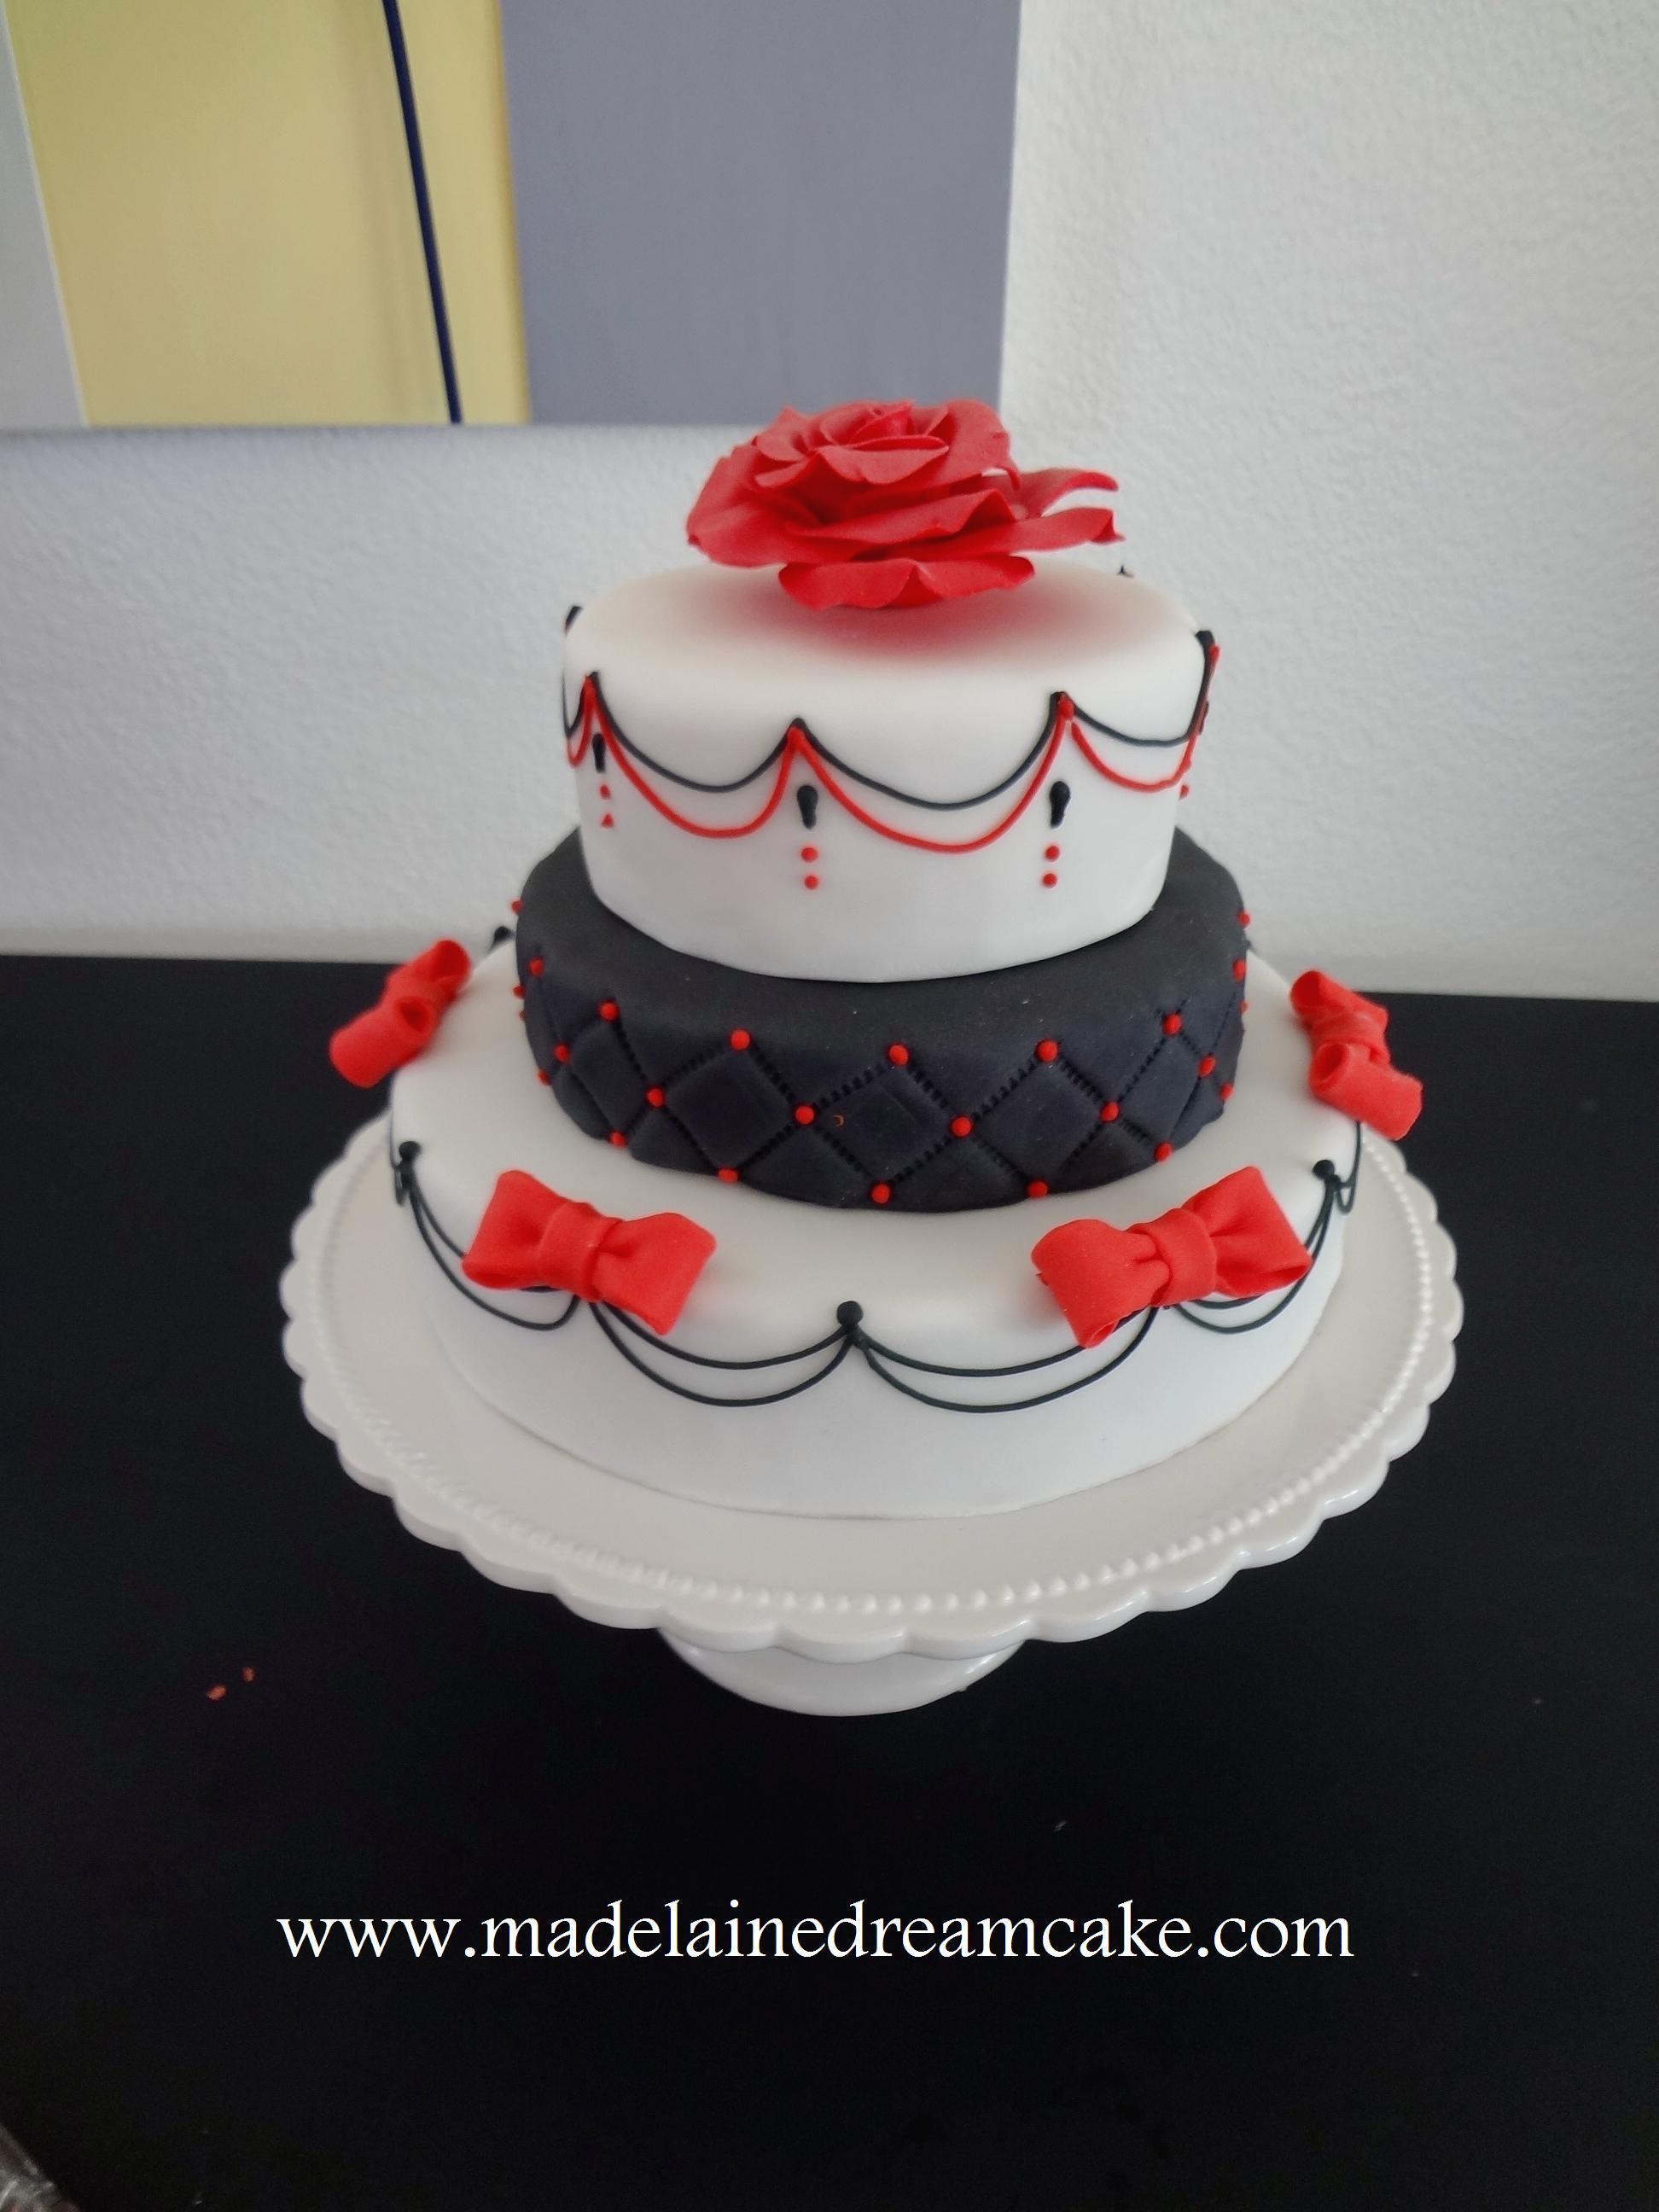 Torte Madelainedreamcake Seite 11